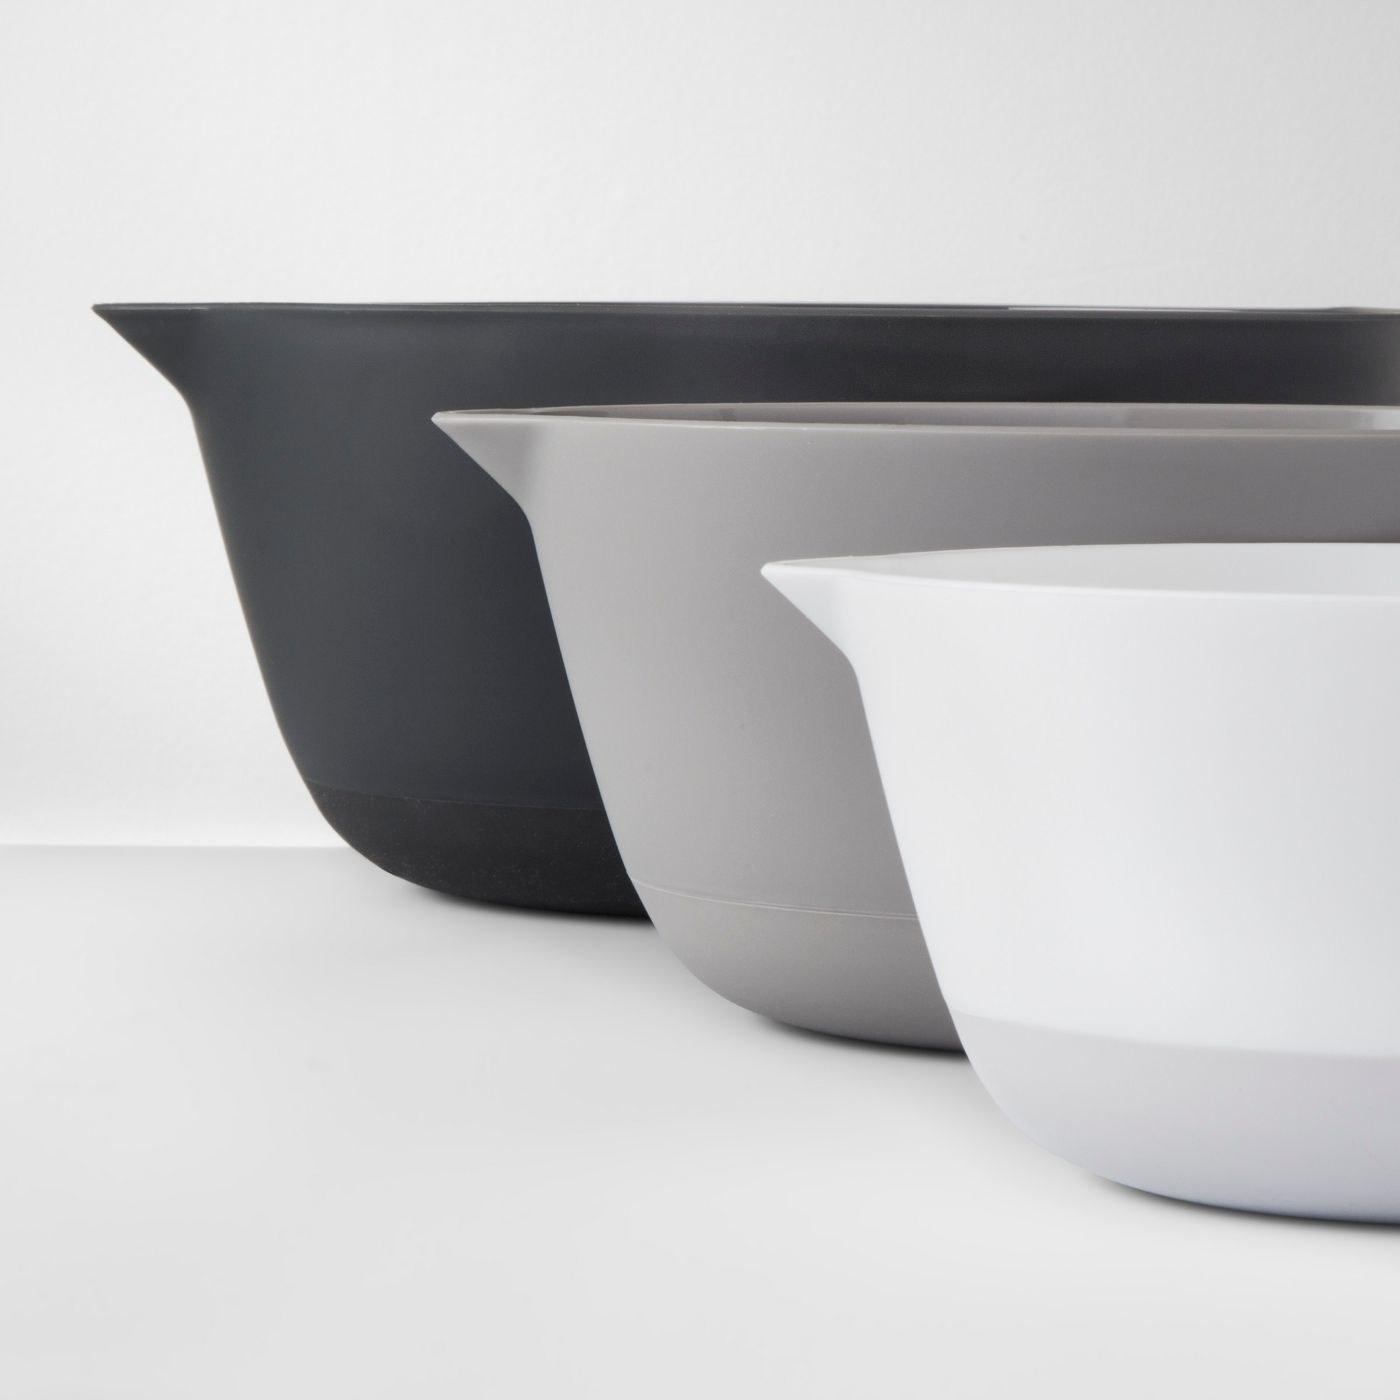 the set of three mixing bowls